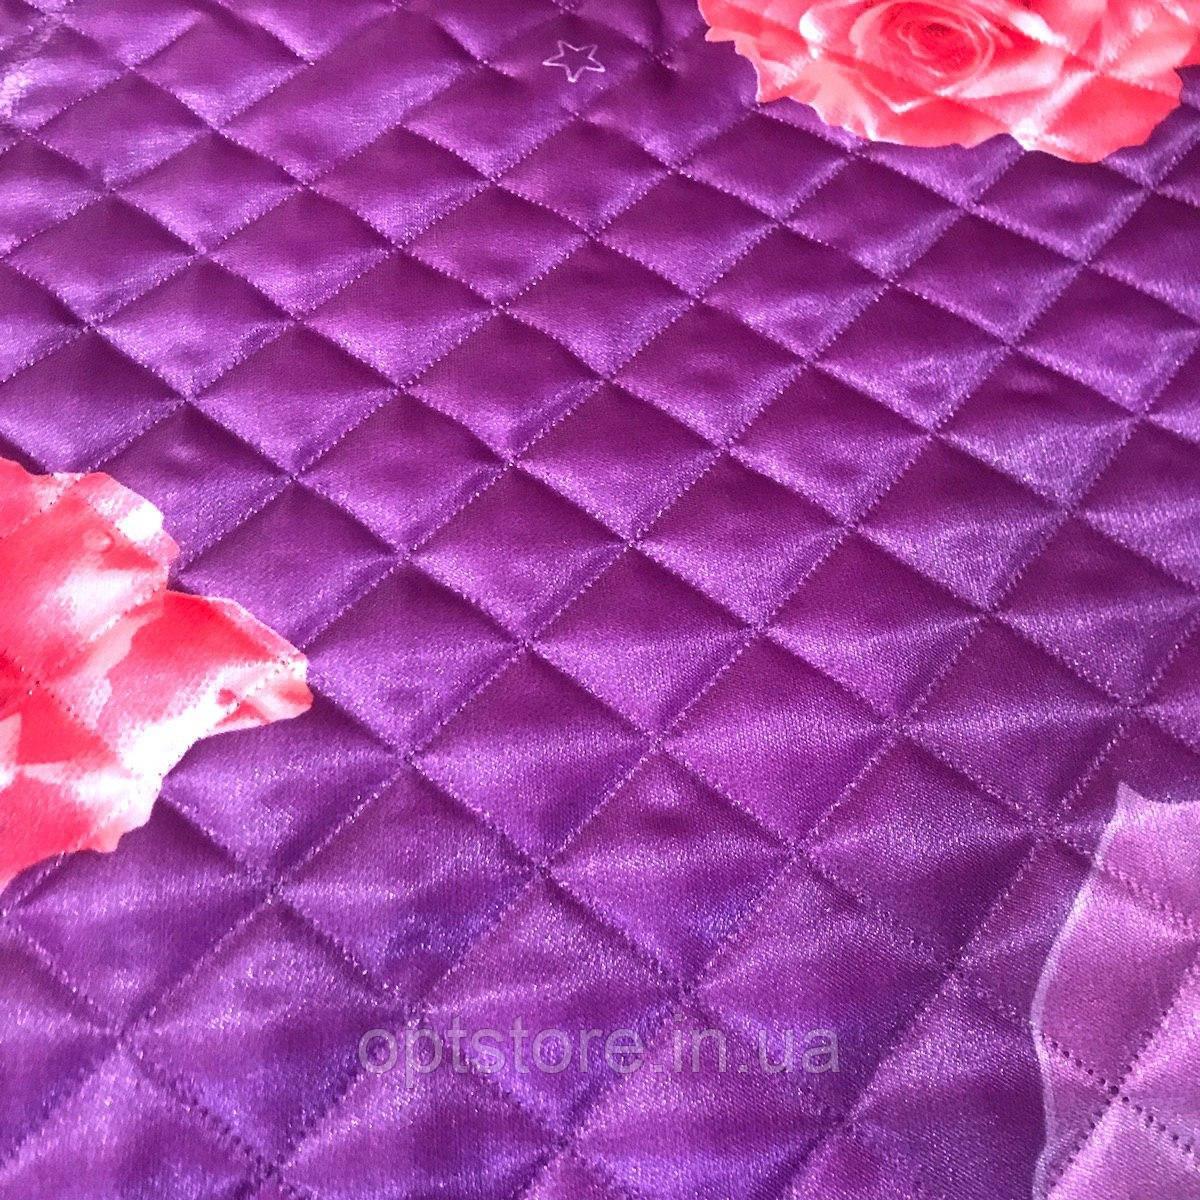 Атласное летнее одеяло-покрывало евро размер 195/205 см